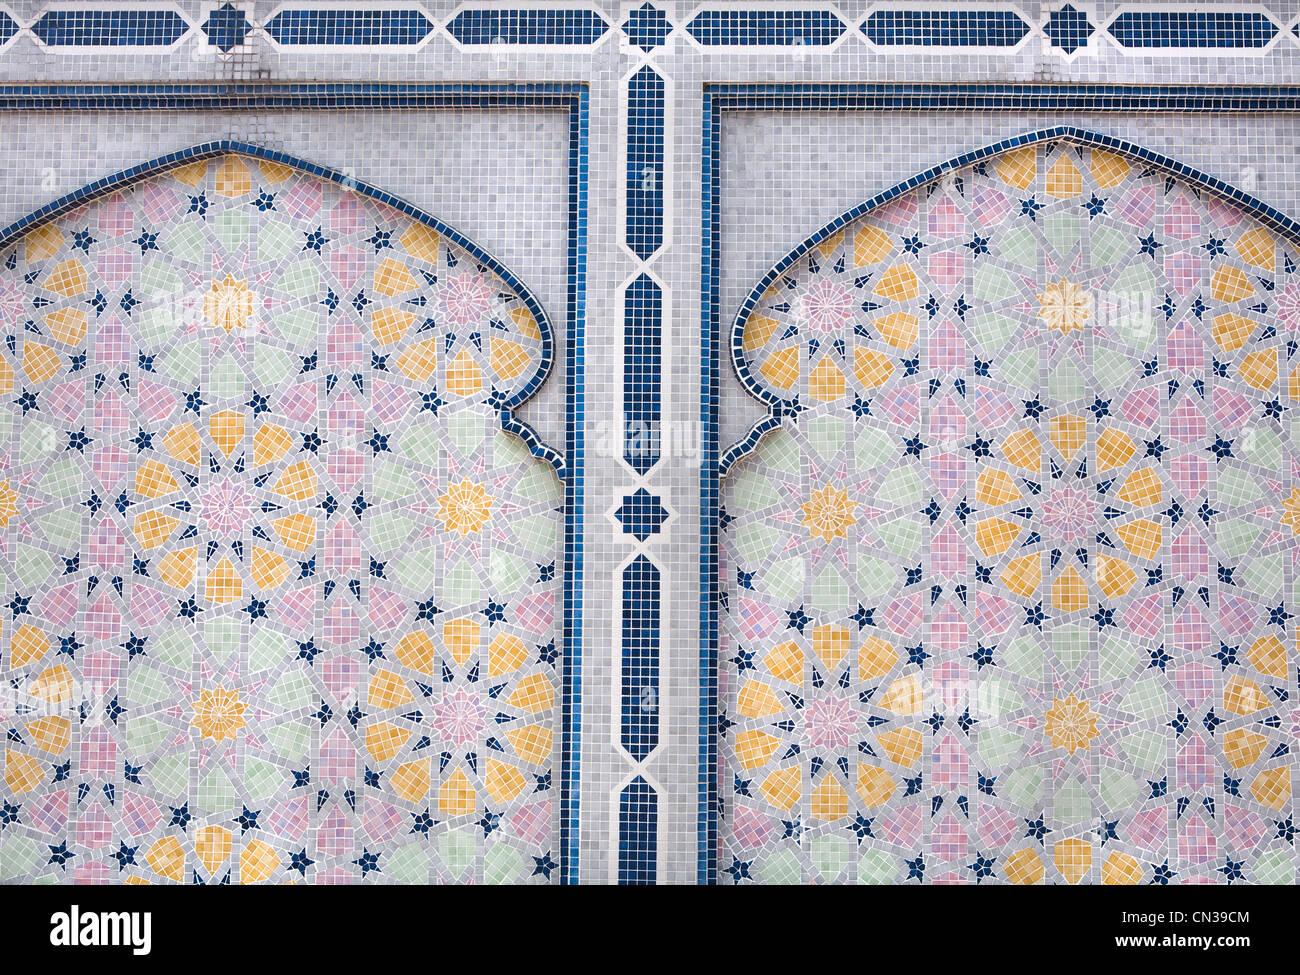 Decorative tile detail, Jame' asr hassanal bolkiah mosque, Bandar Seri Bagawan, Brunei - Stock Image